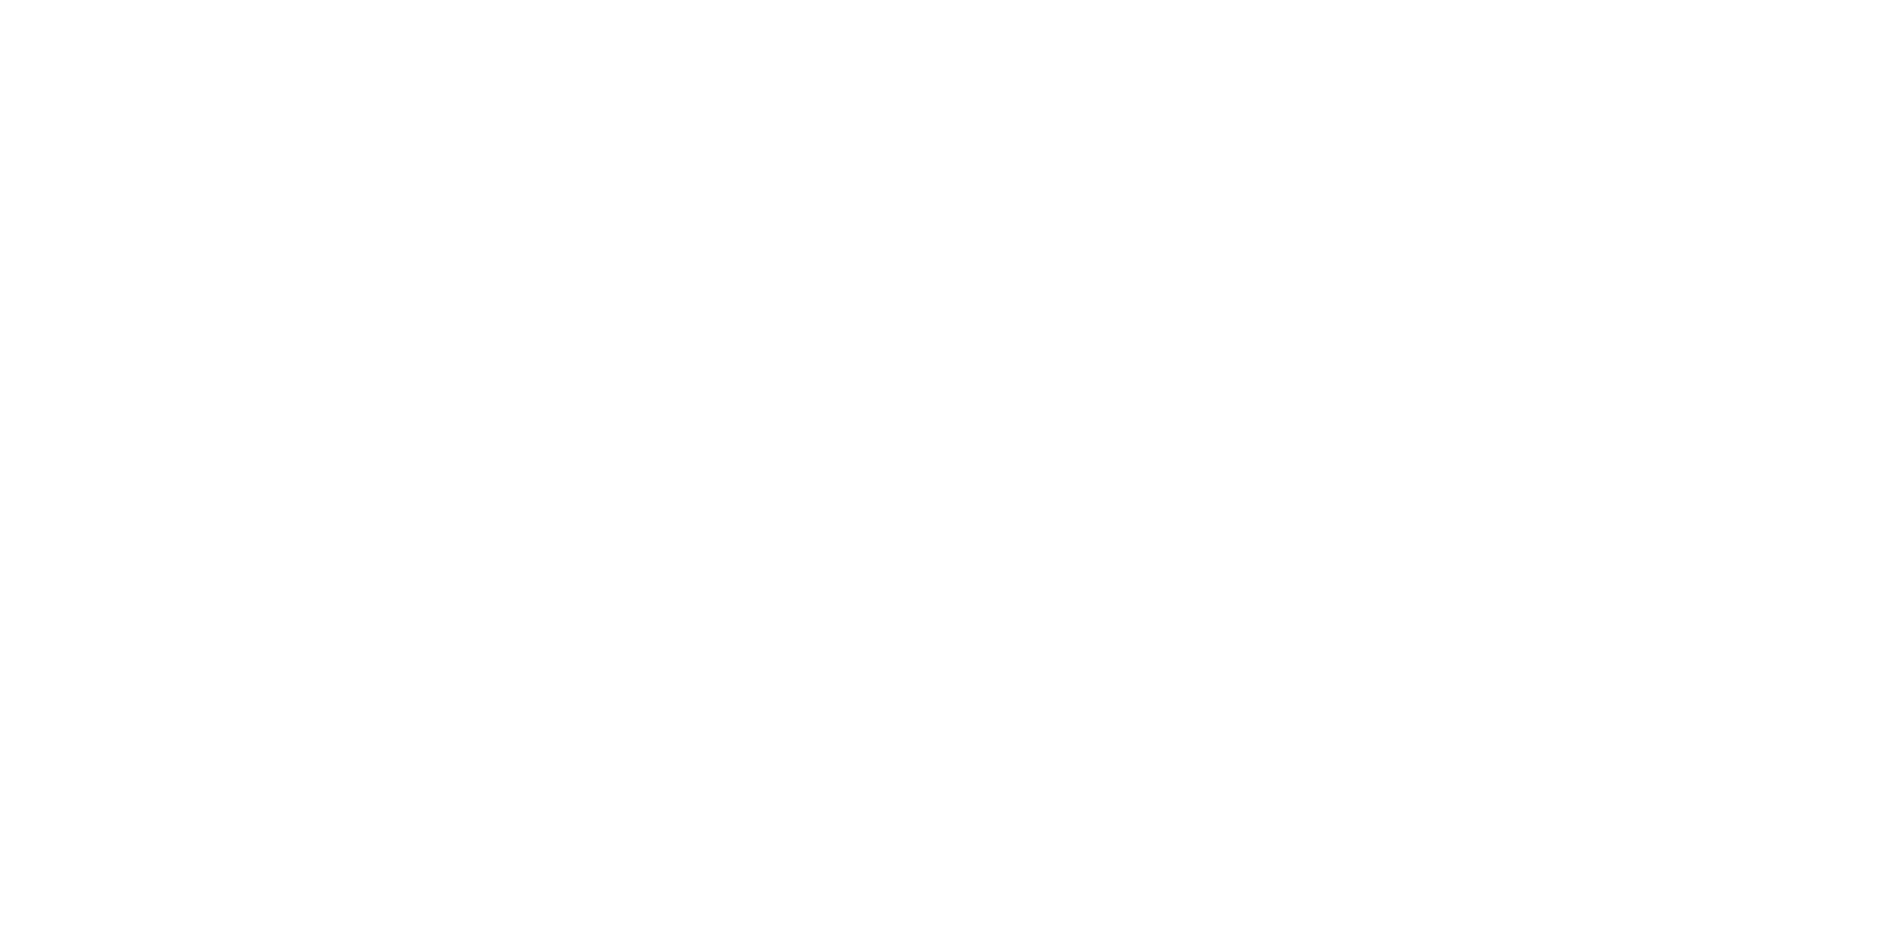 pixel de facebook ejemplo